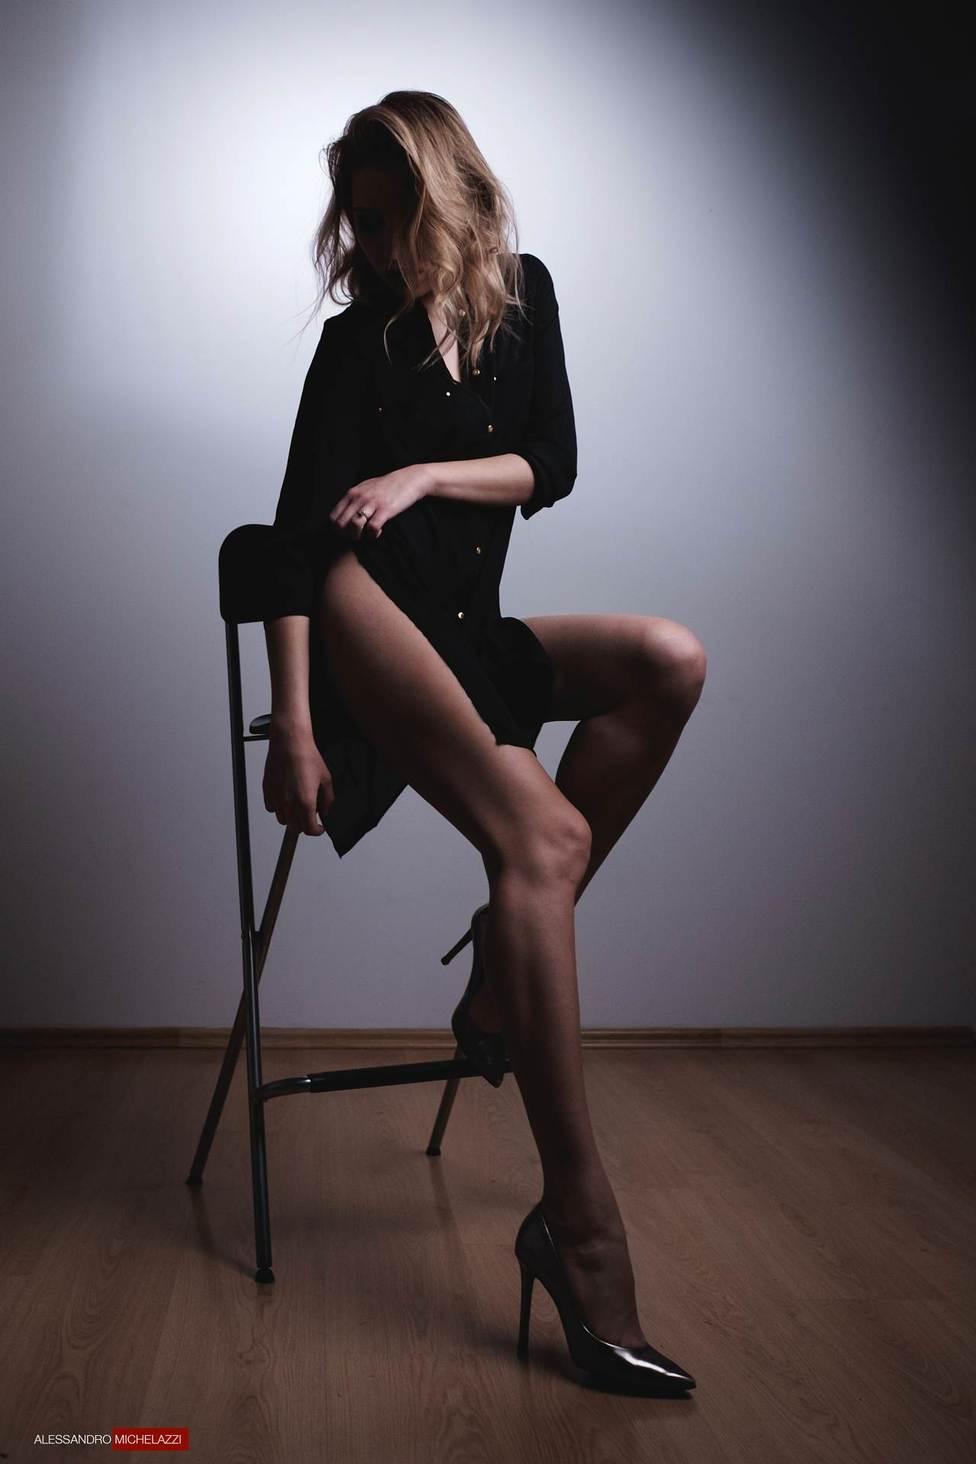 Alessandro-Michelazzi-Photography-X70-Fashion-Test-13